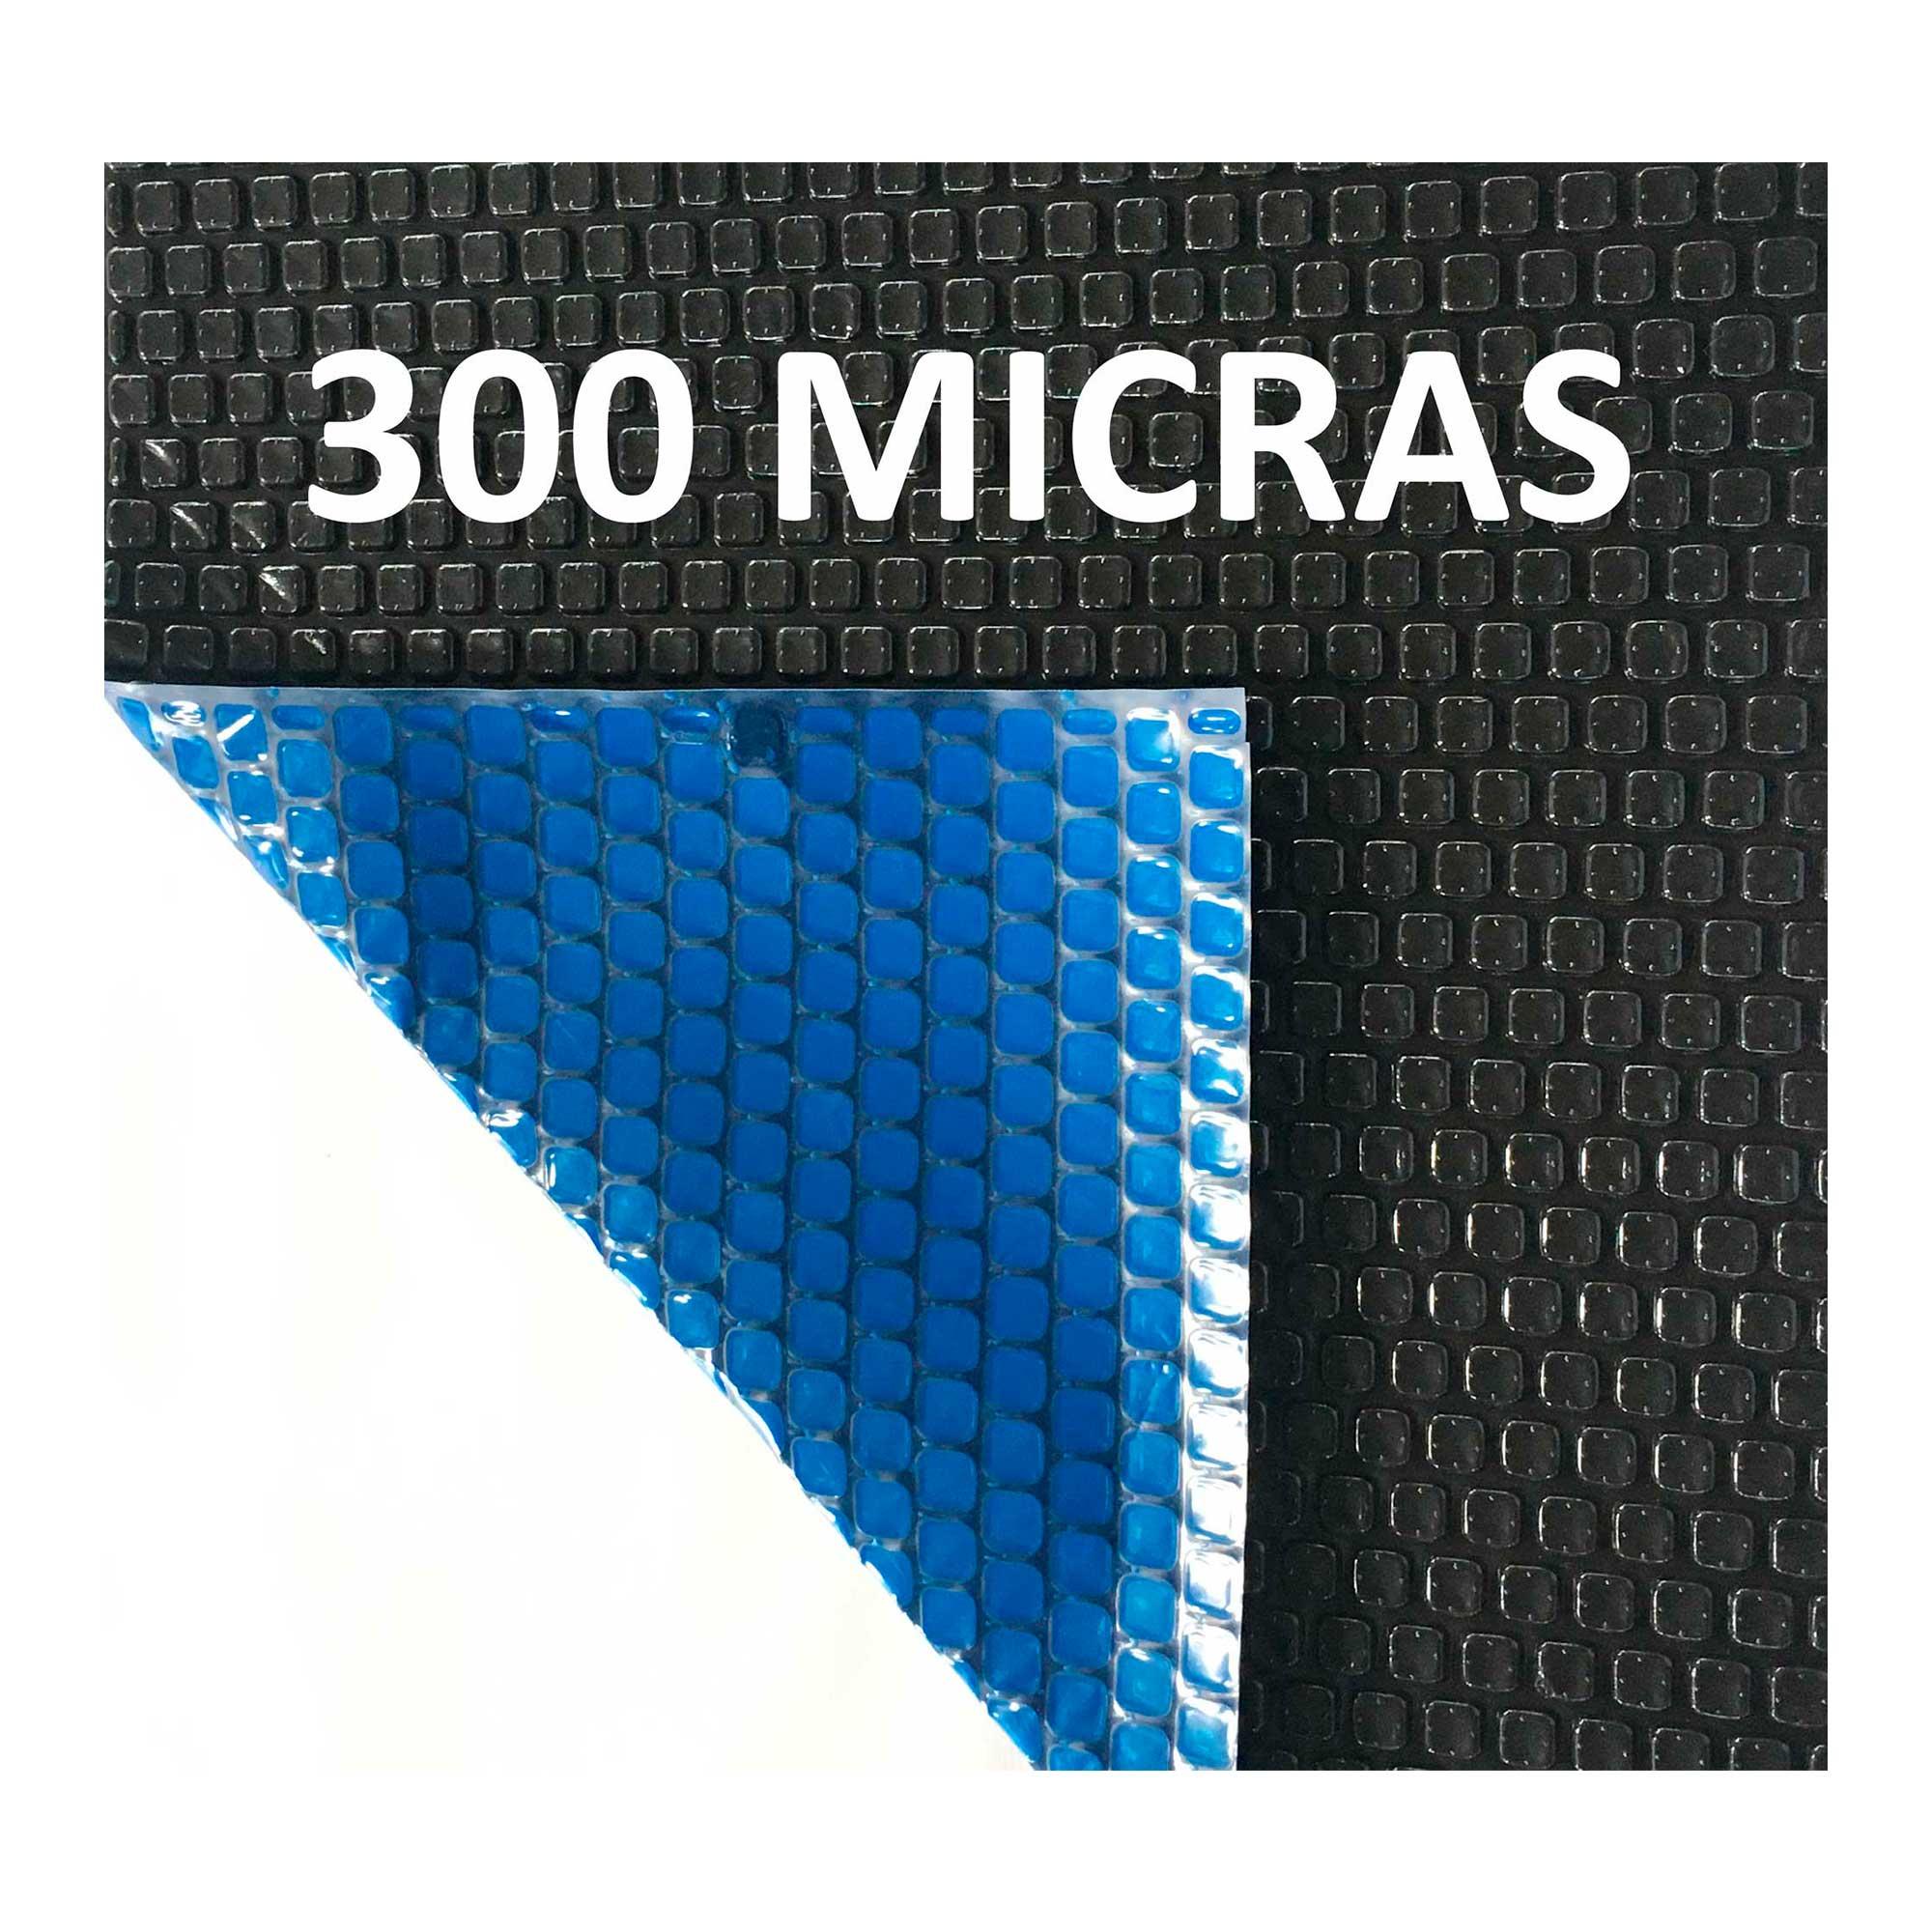 Capa Térmica Blackout para Piscinas Aquecida 300 Micras